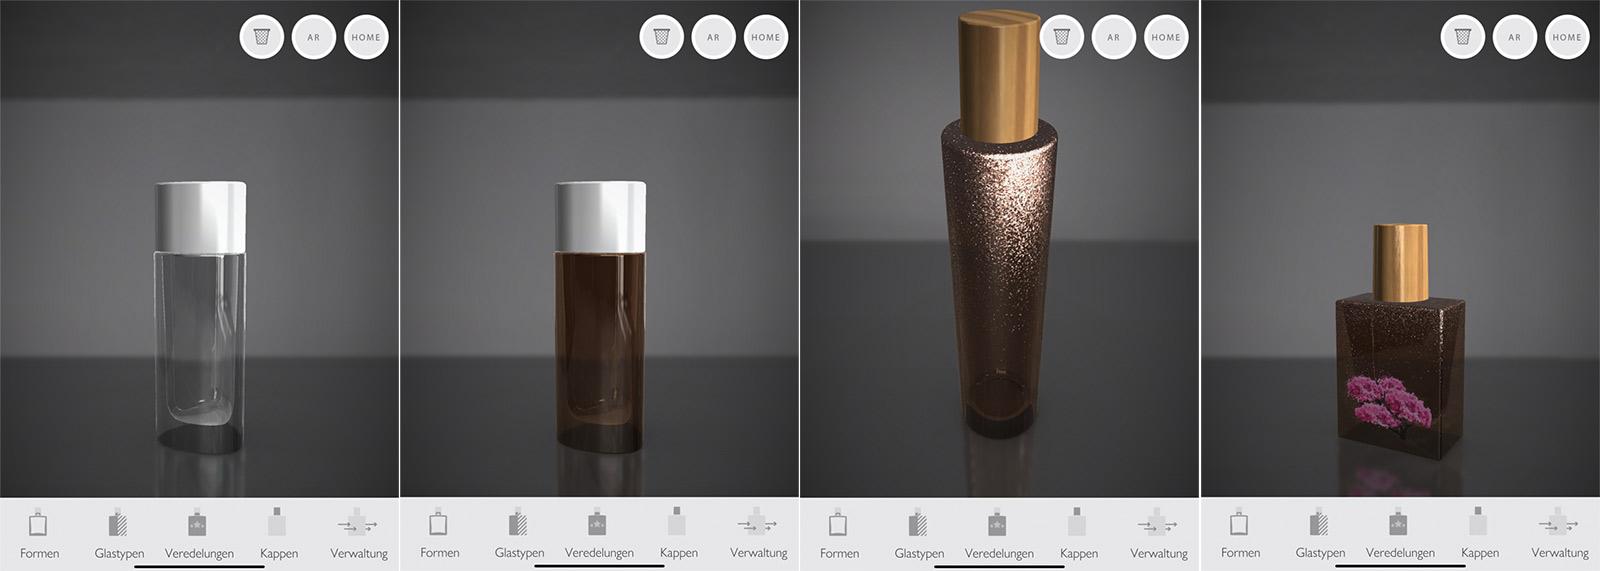 Produkt-Konfiguration mit AR